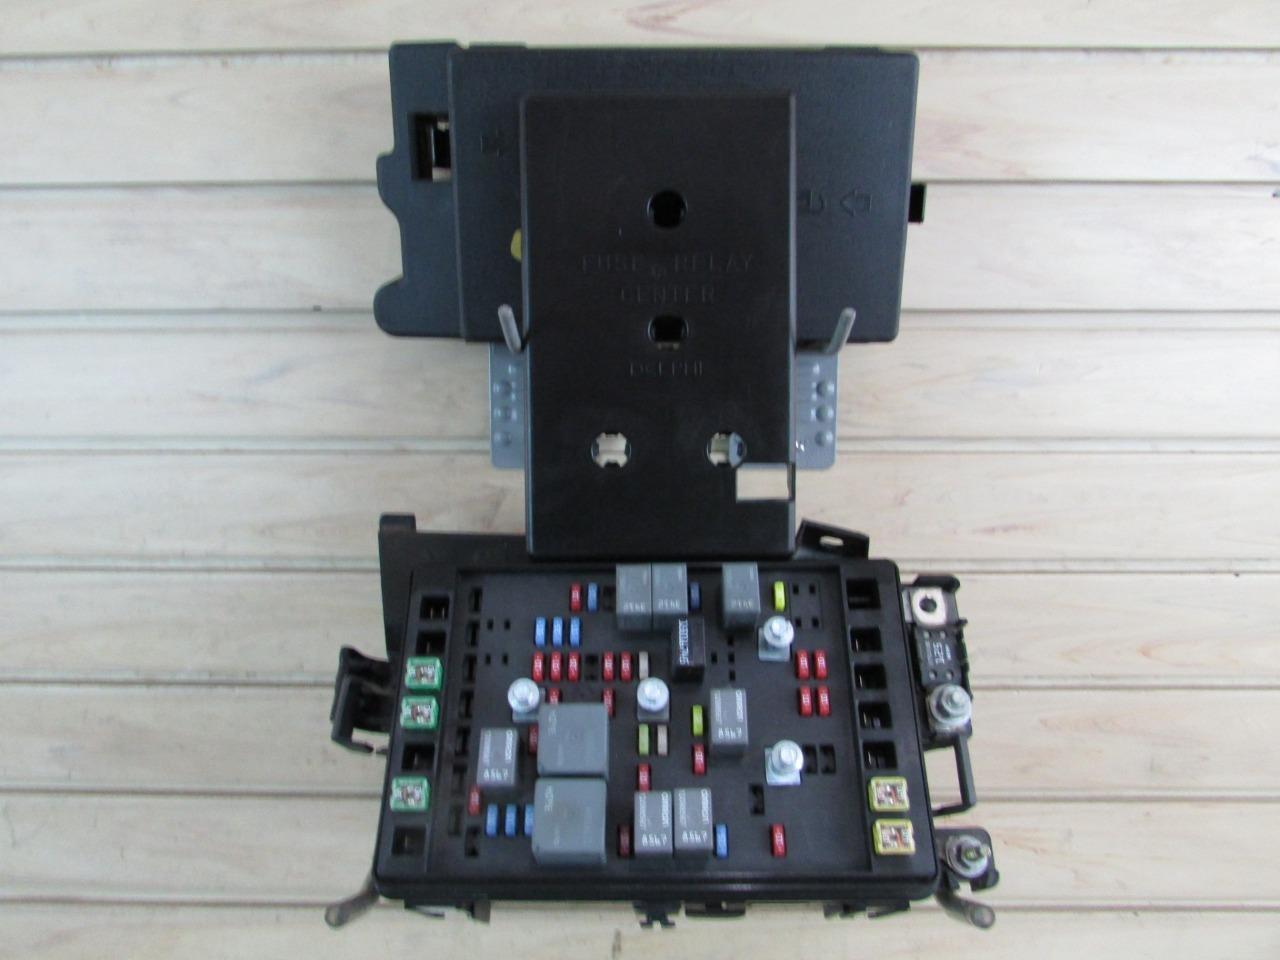 03 04 Chevrolet SSR - Engine Fuse Block Relay Box - 5.3L - P/N 15106508